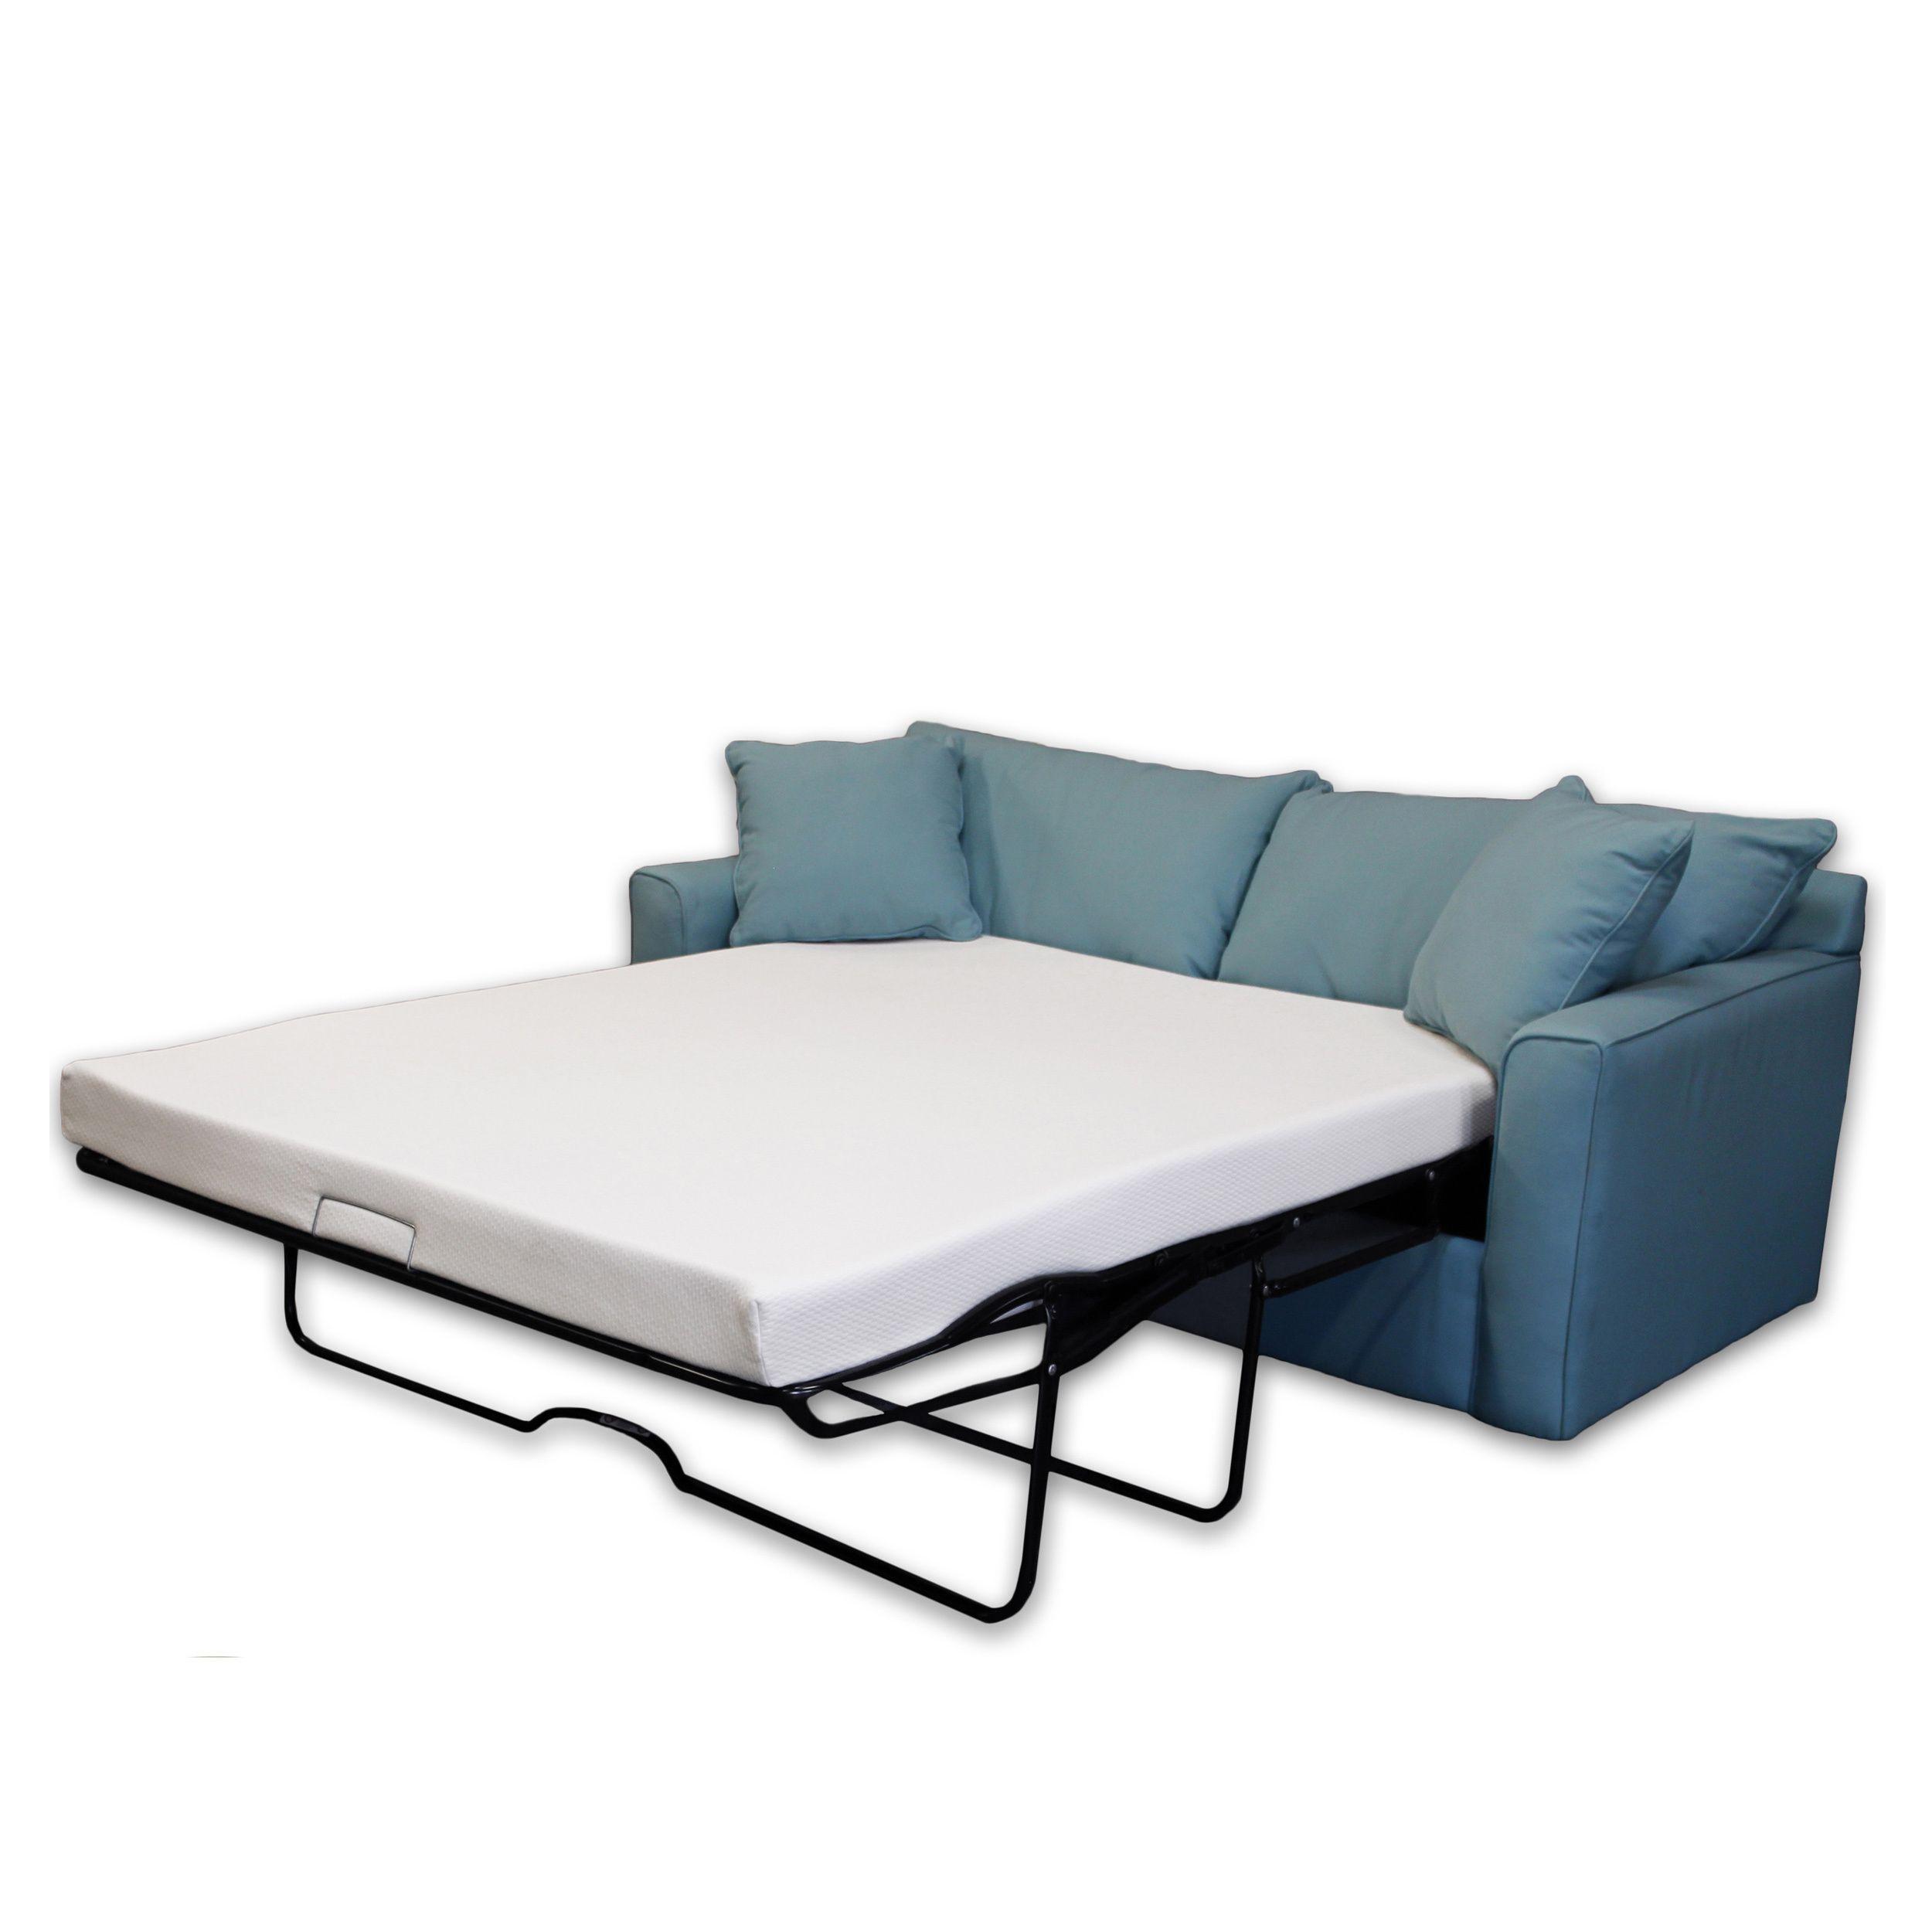 Select Luxury New Life 4 5 Inch Full Size Memory Foam Sofa Bed Sleeper Mattress Mattress Only New Life 4 5 Memo Sofa Bed Mattress Sofa Bed Sleeper Foam Sofa